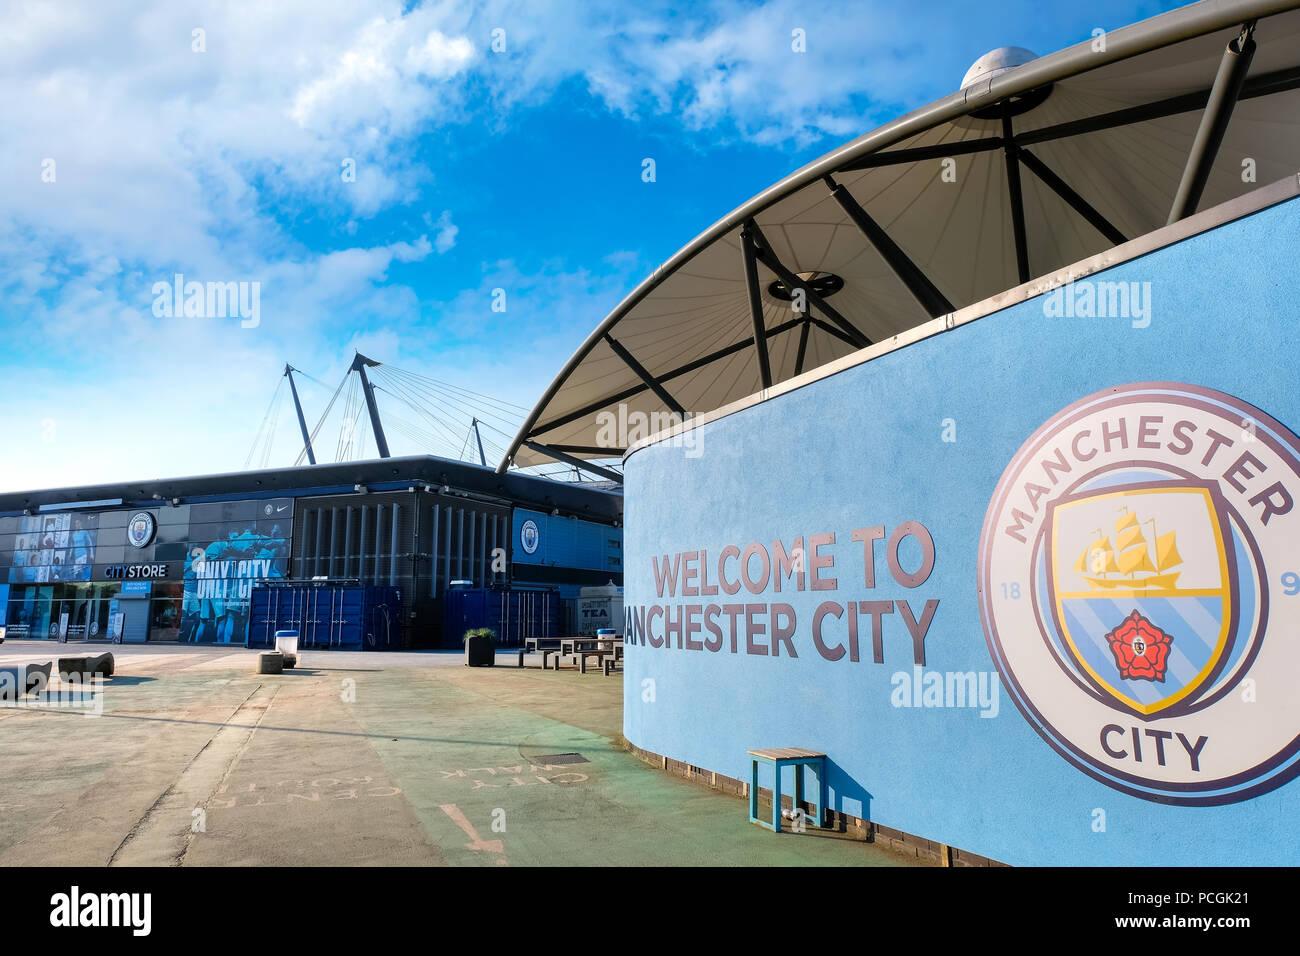 Etihad Stadium of Manchester City Football Club in Manchester, UK - Stock Image